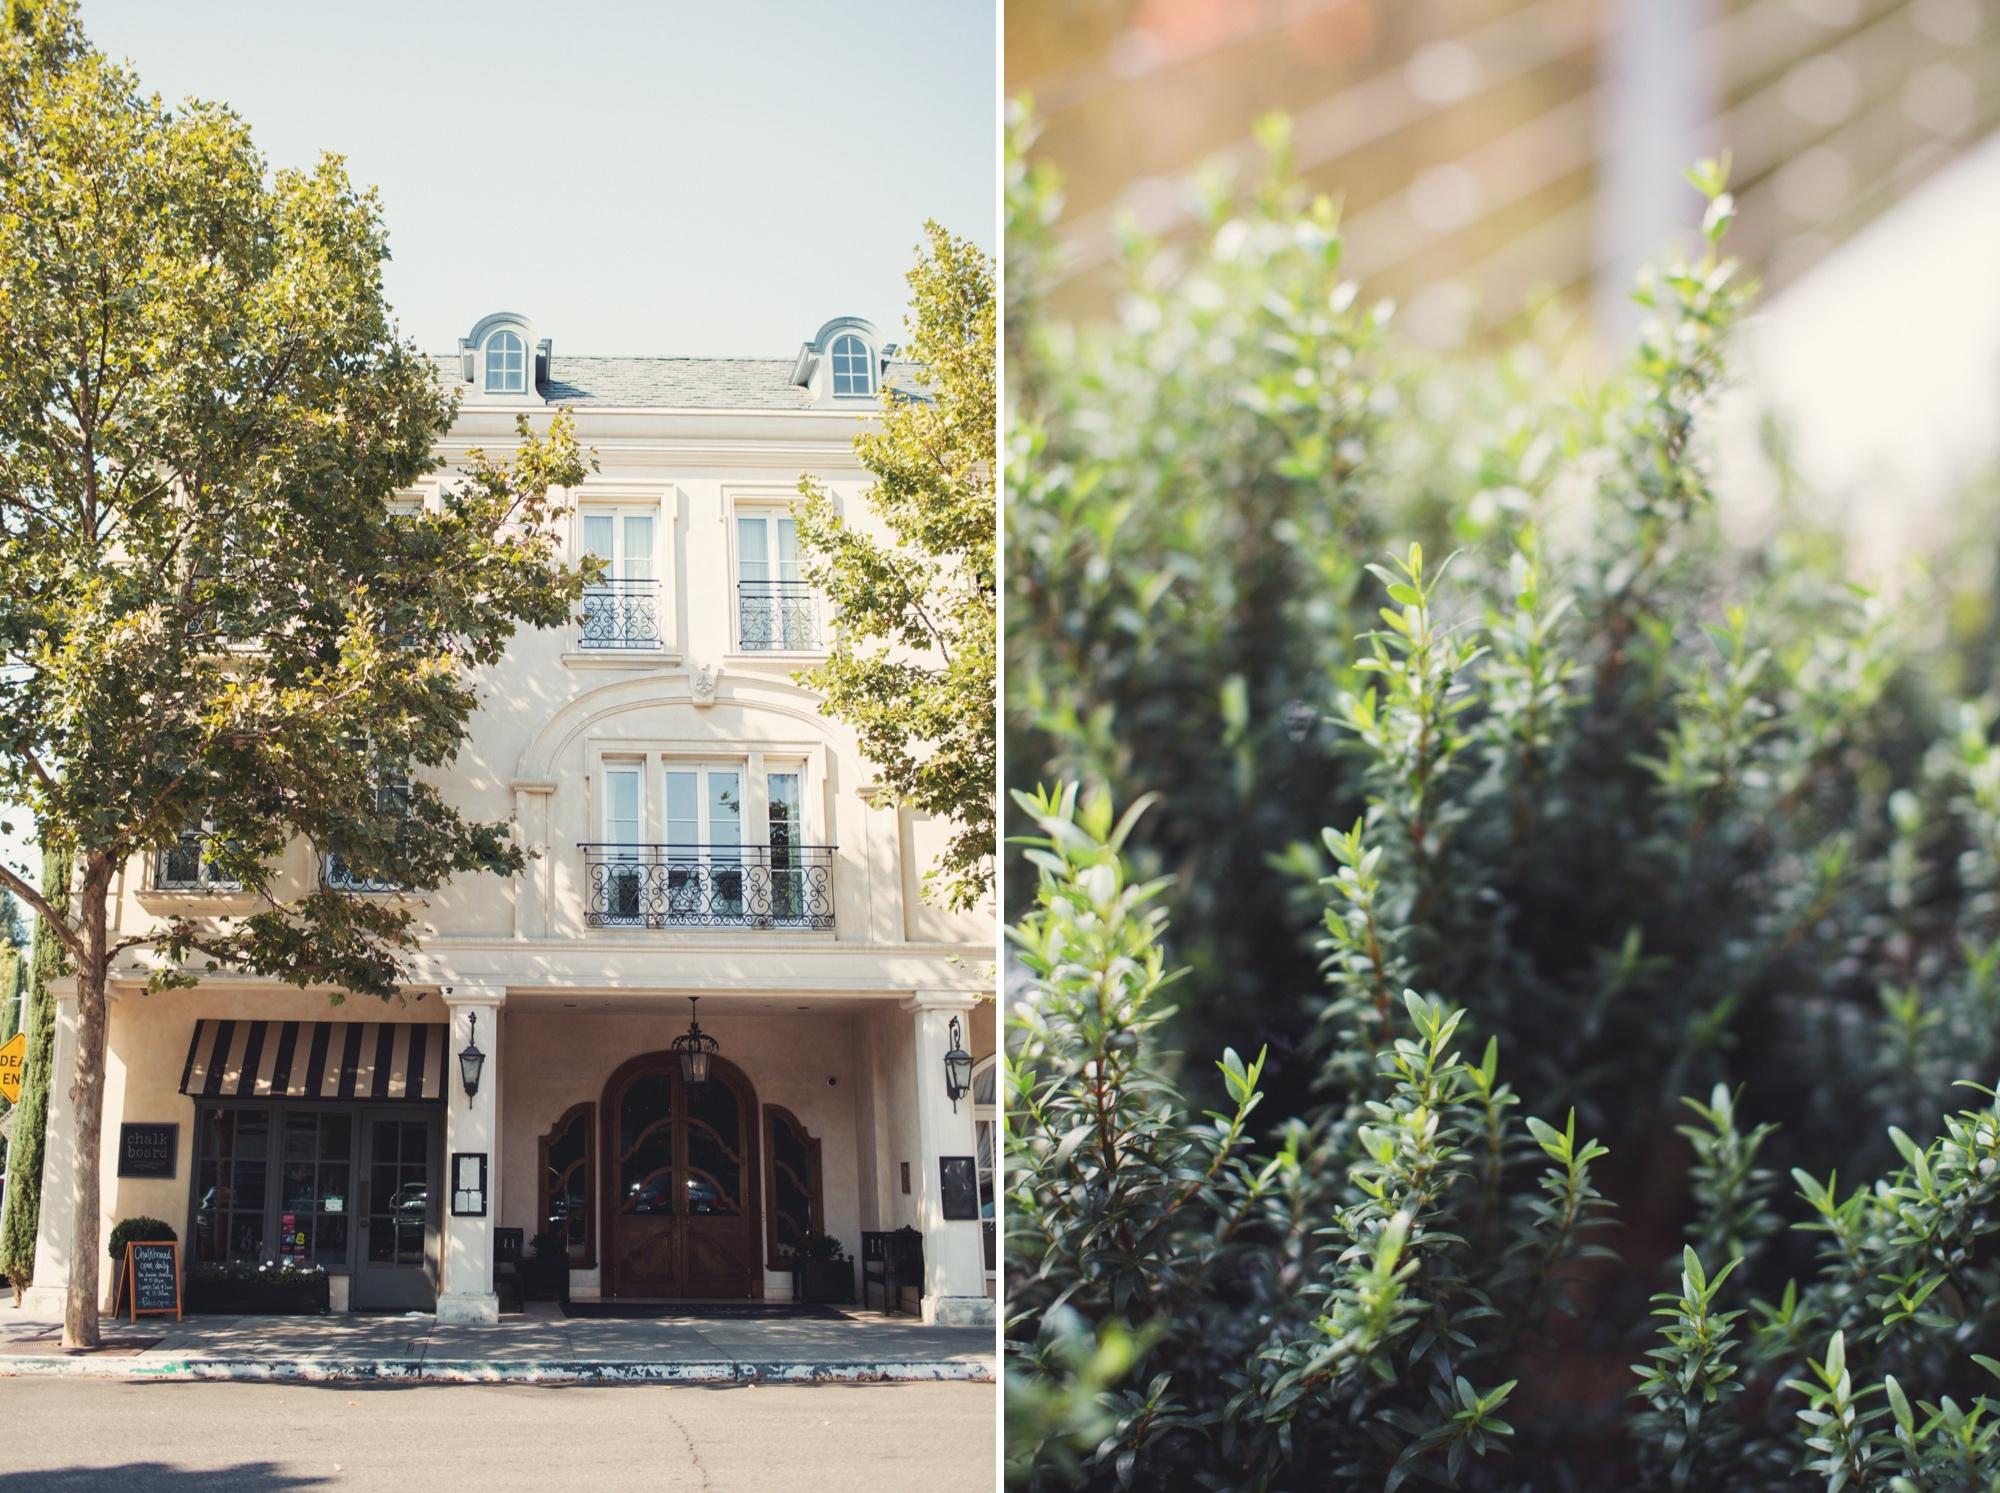 Hotel Les Mars Healdsburg - Anne-Claire Brun Photography